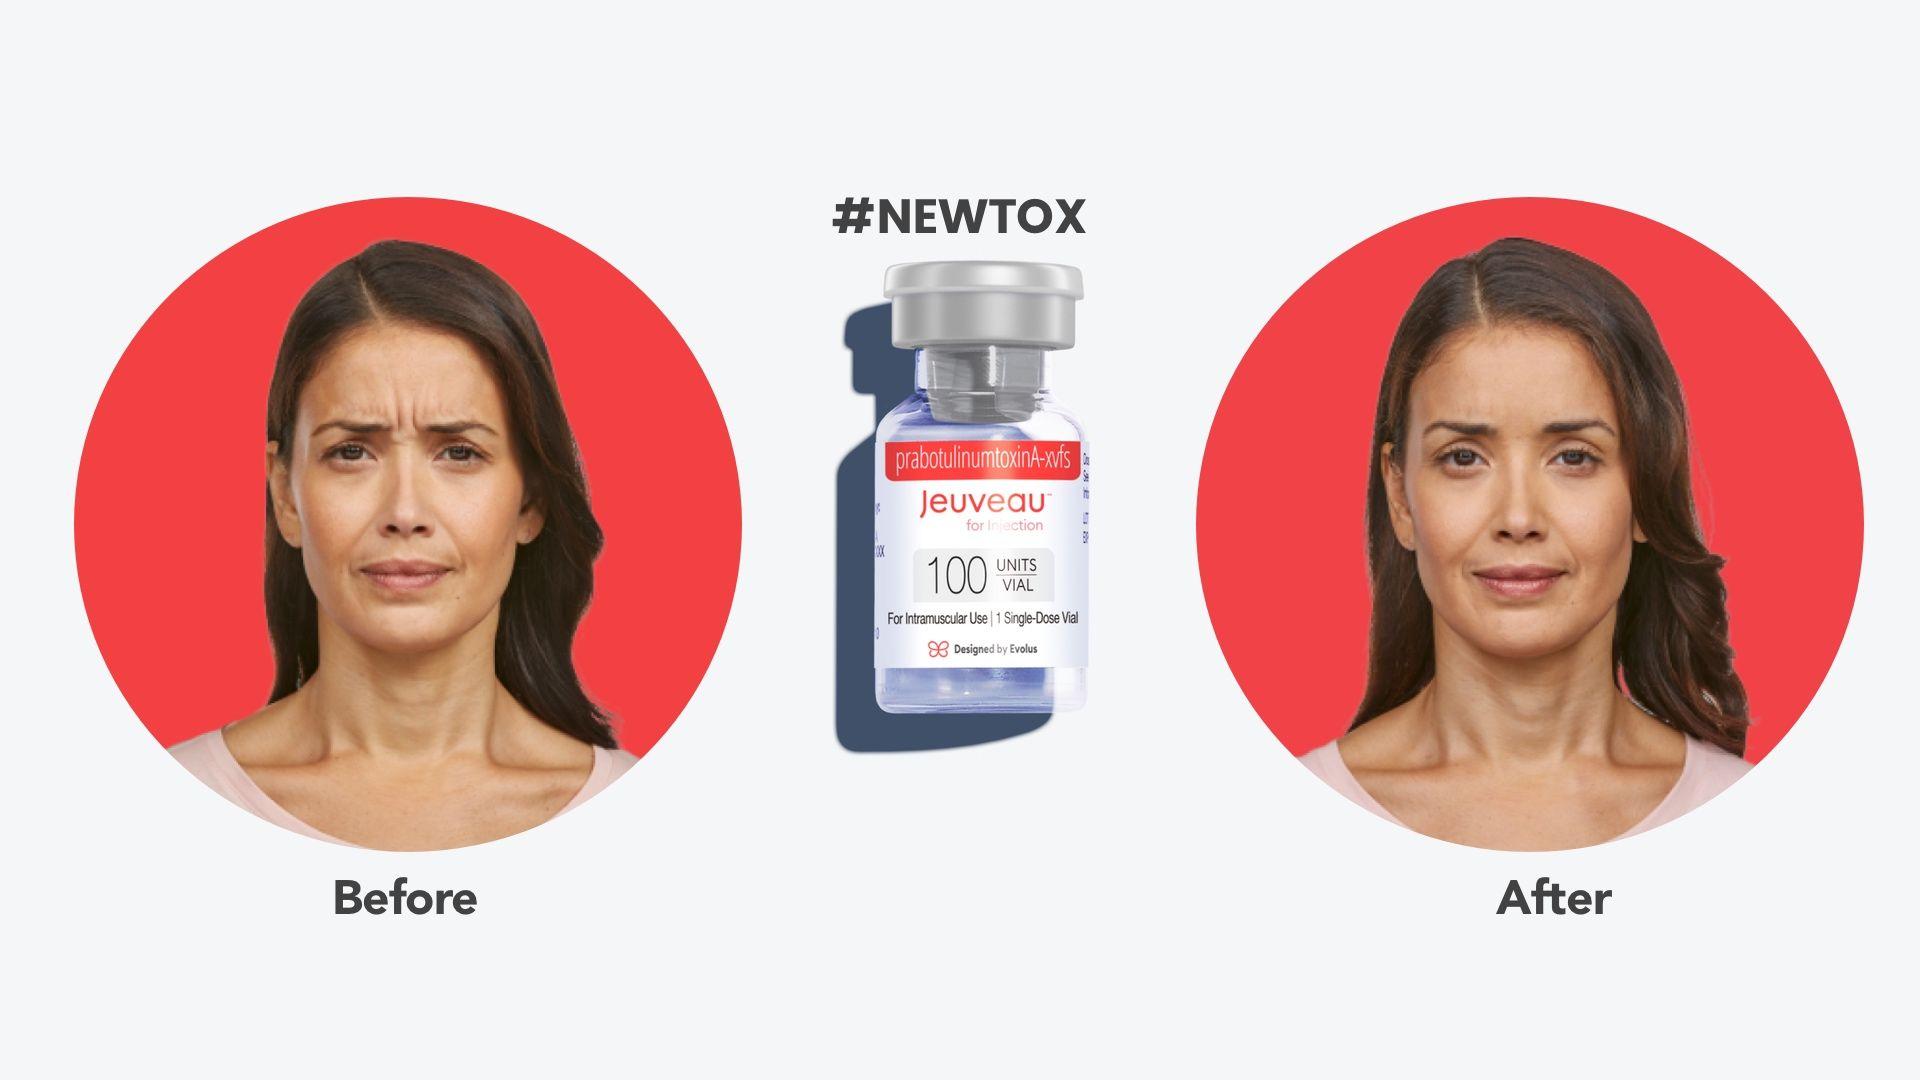 jeuveau-newtox-before-after